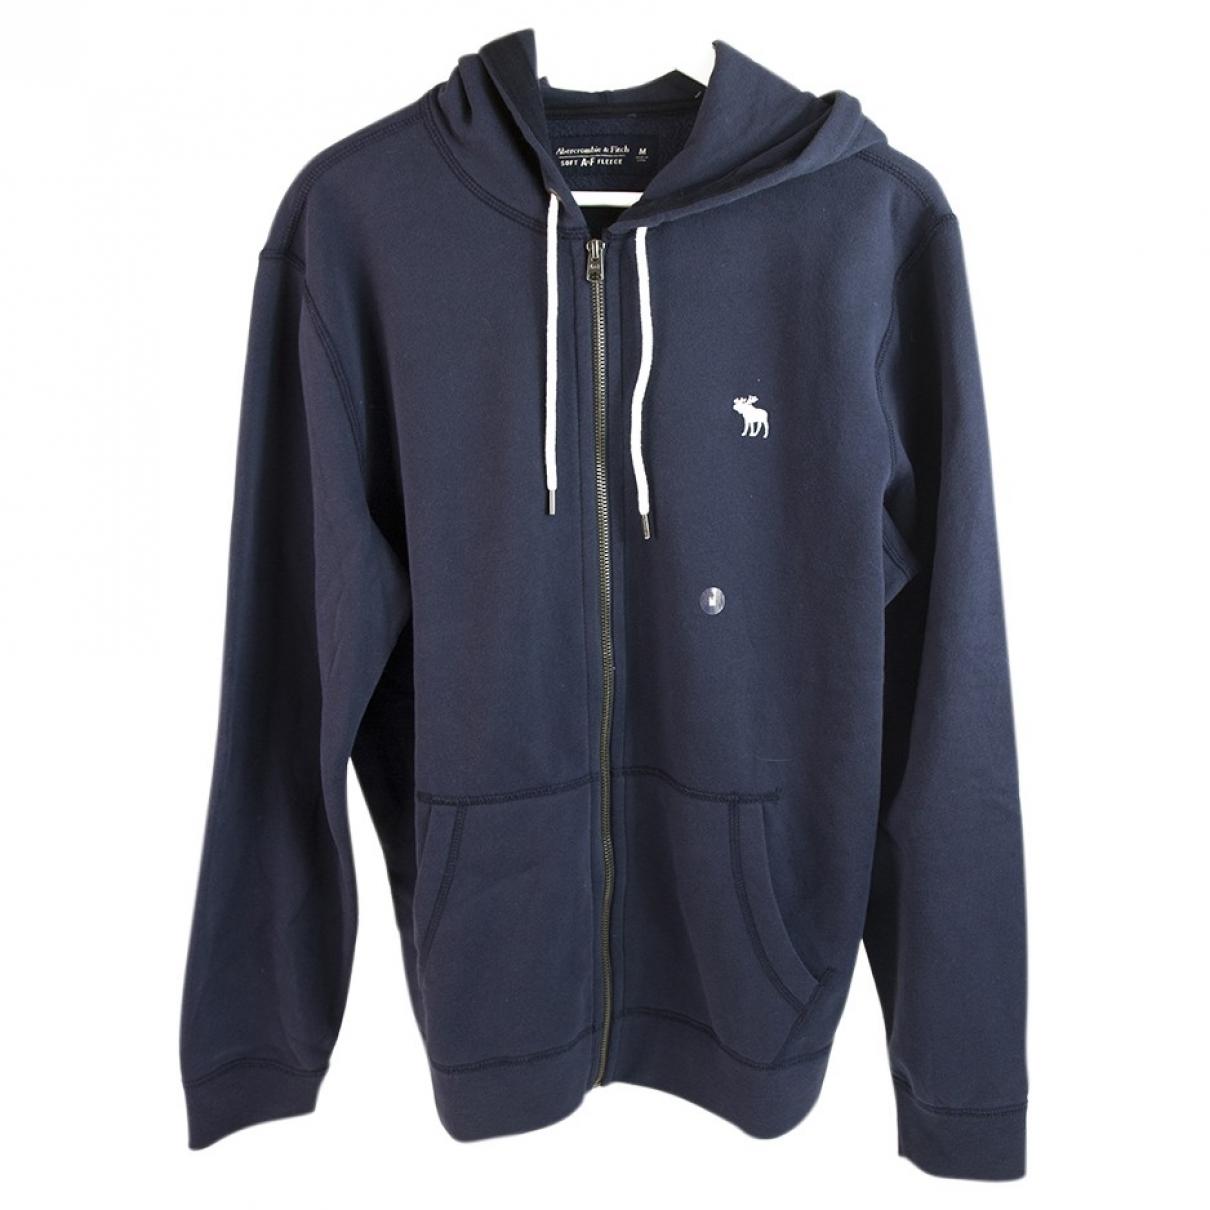 Abercrombie & Fitch \N Blue Cotton jacket  for Men M International